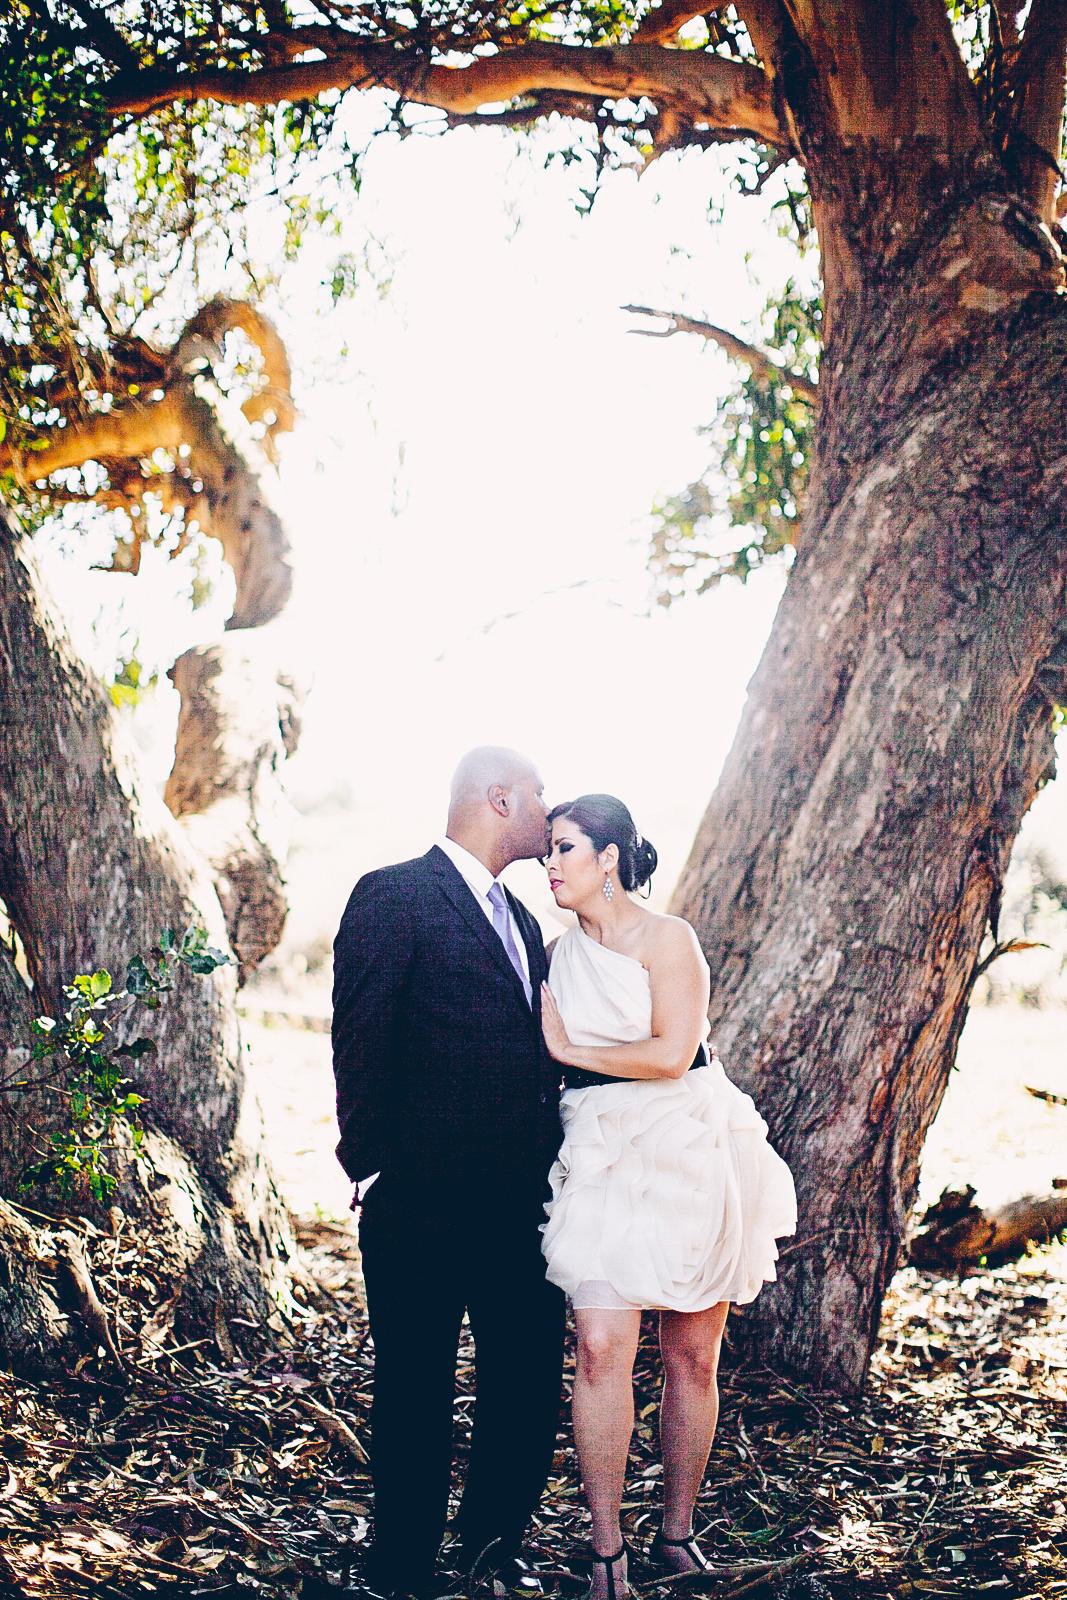 greens_restaurant_wedding_photography_san_franscisco_ebony_siovhan_bokeh_photography_17.jpg